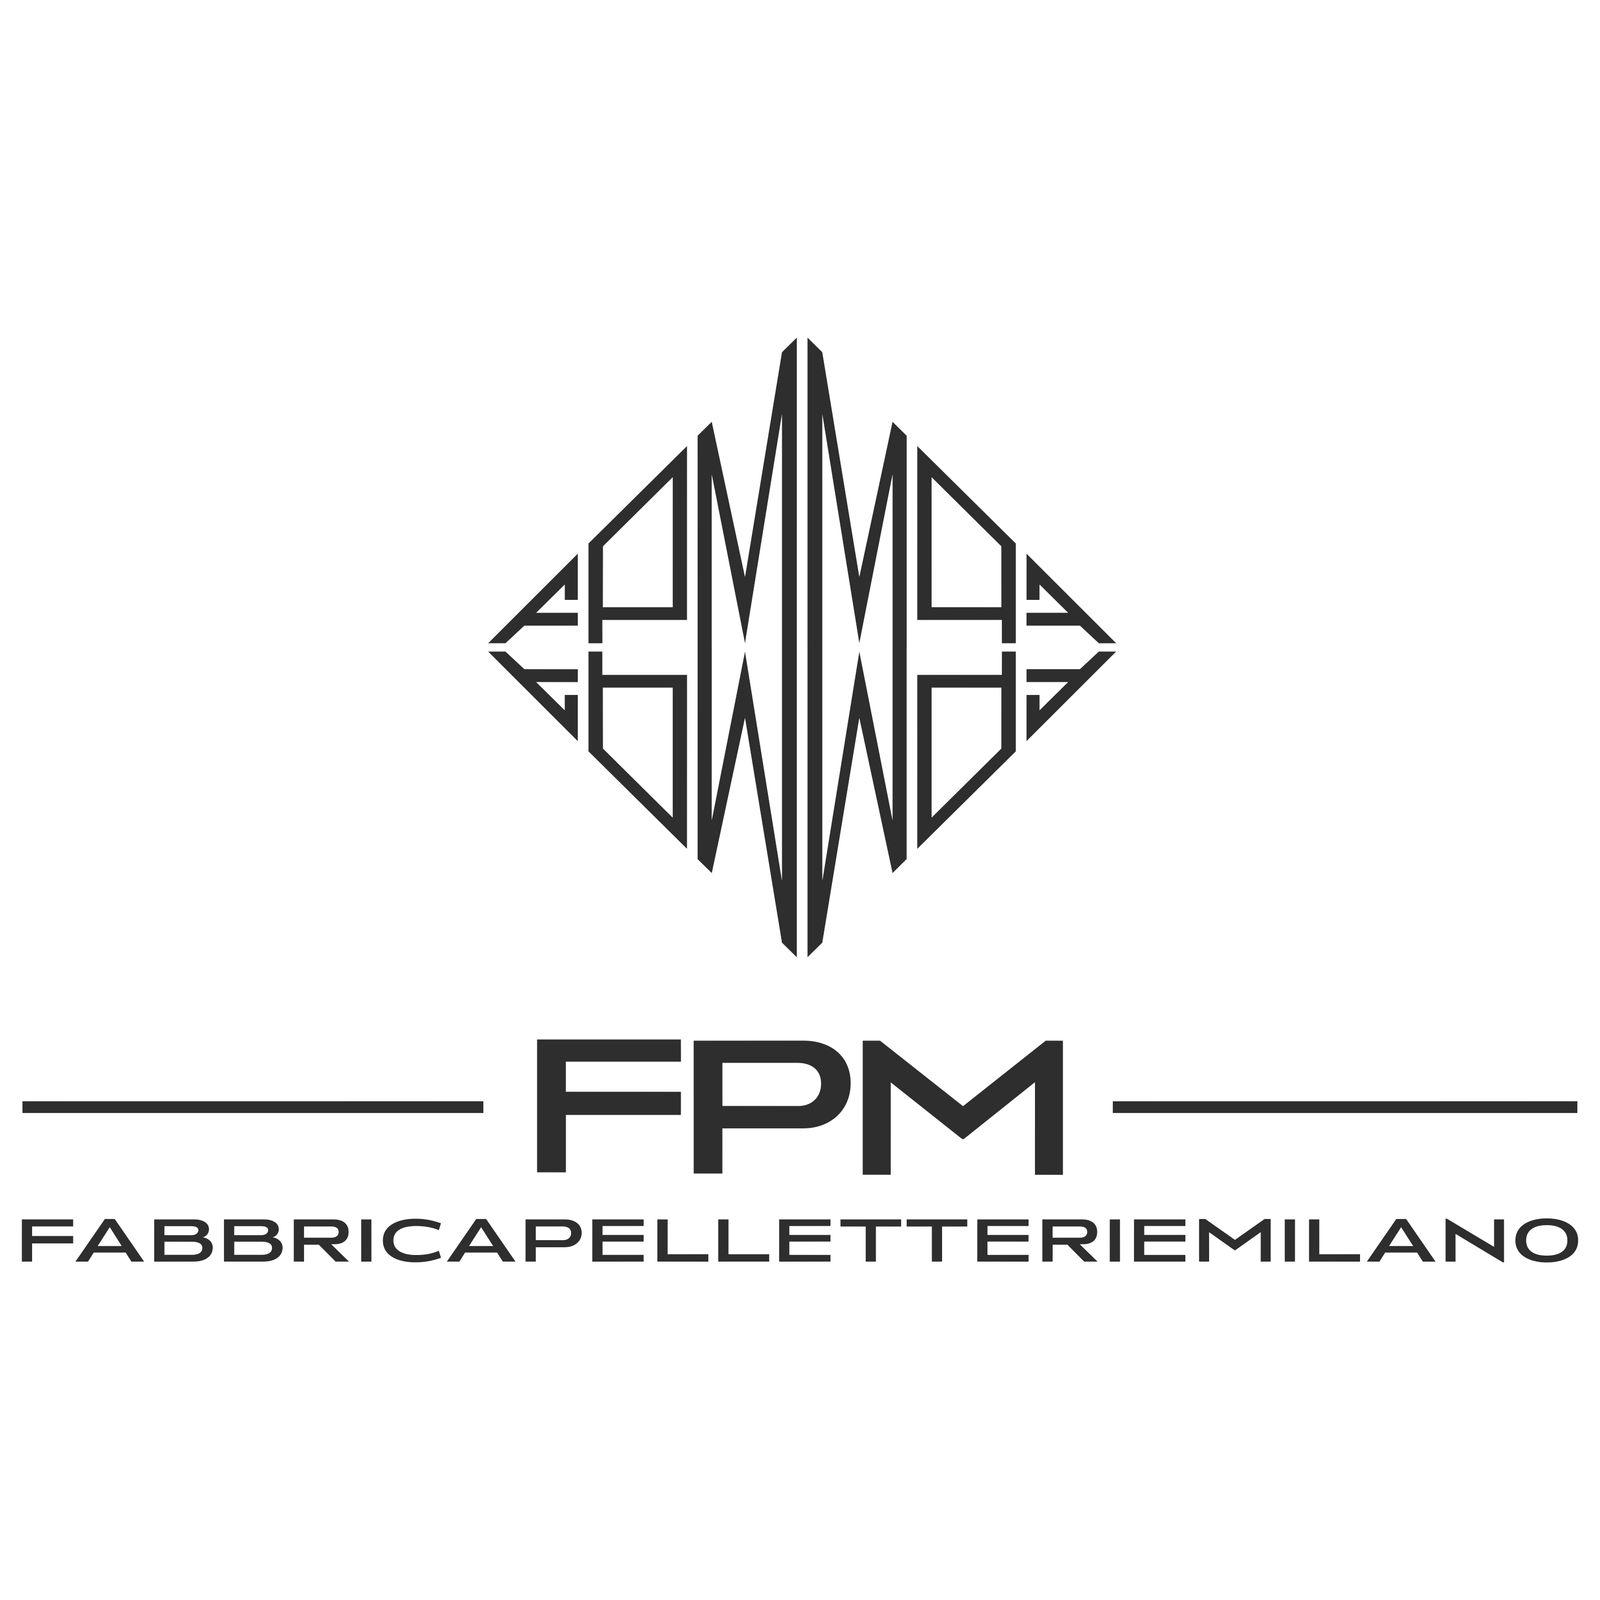 FPM - Fabbrica Pelletterie Milano